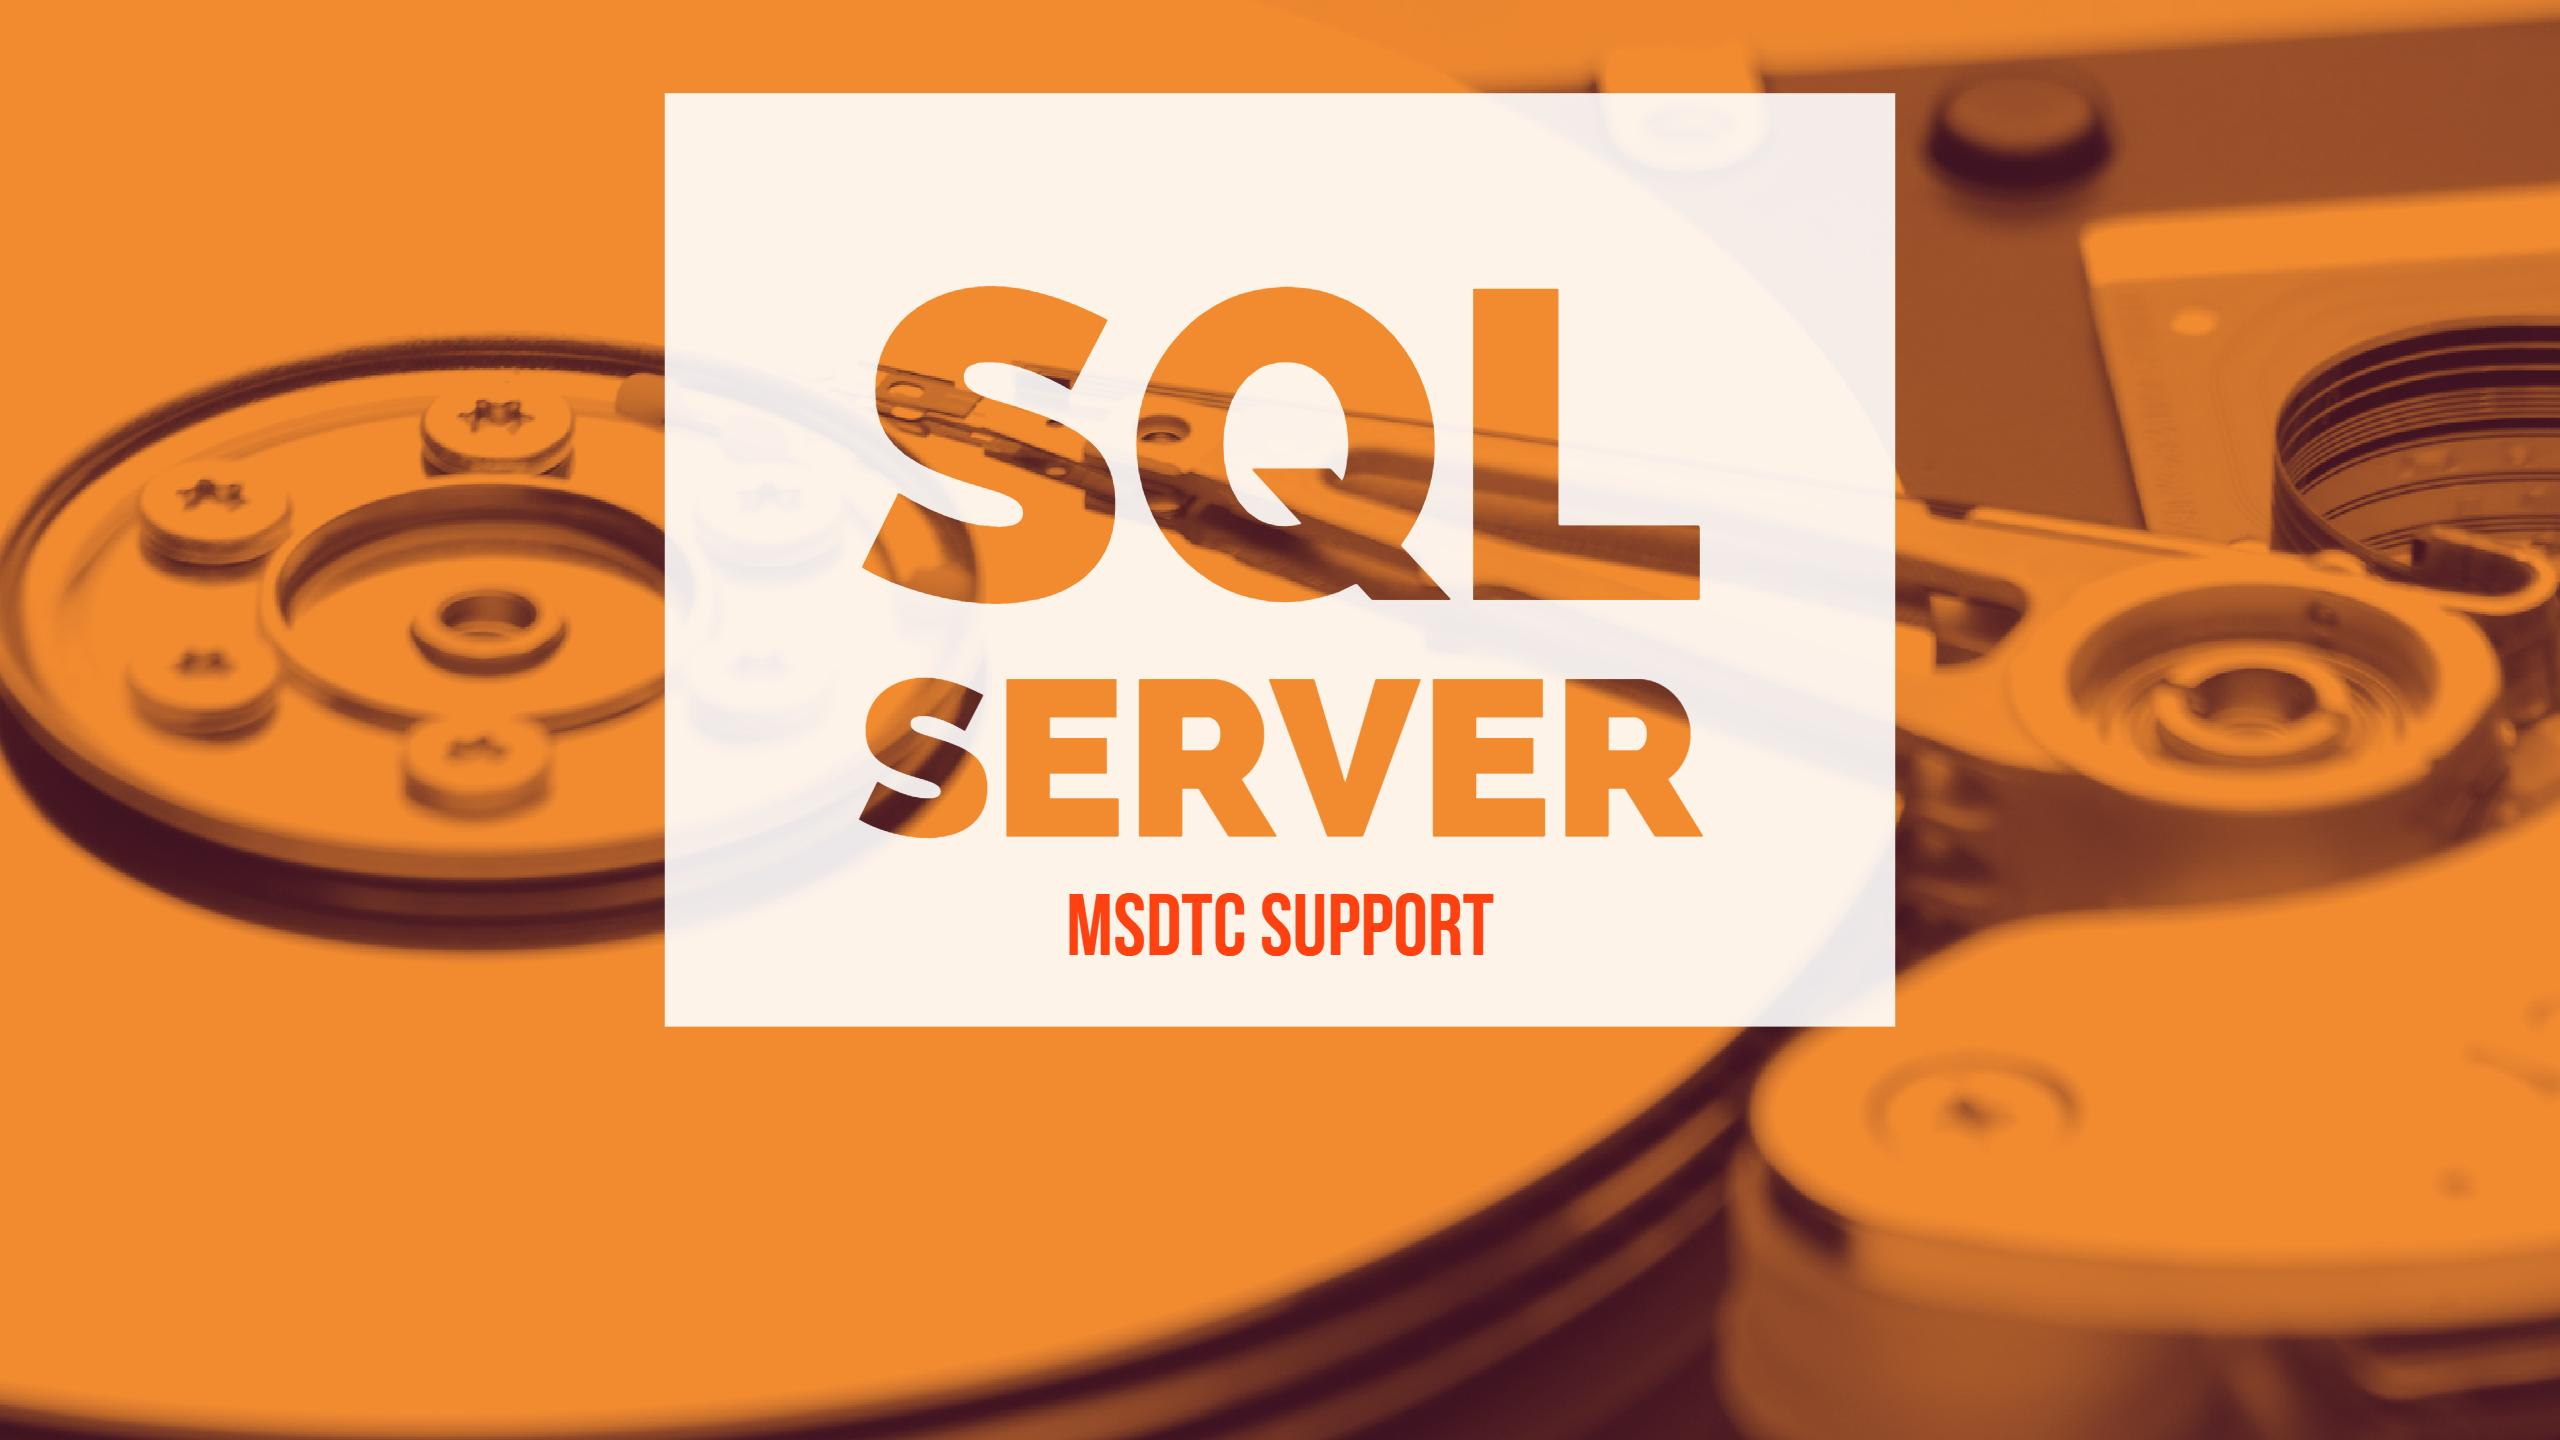 SQL Server MSDTC Support